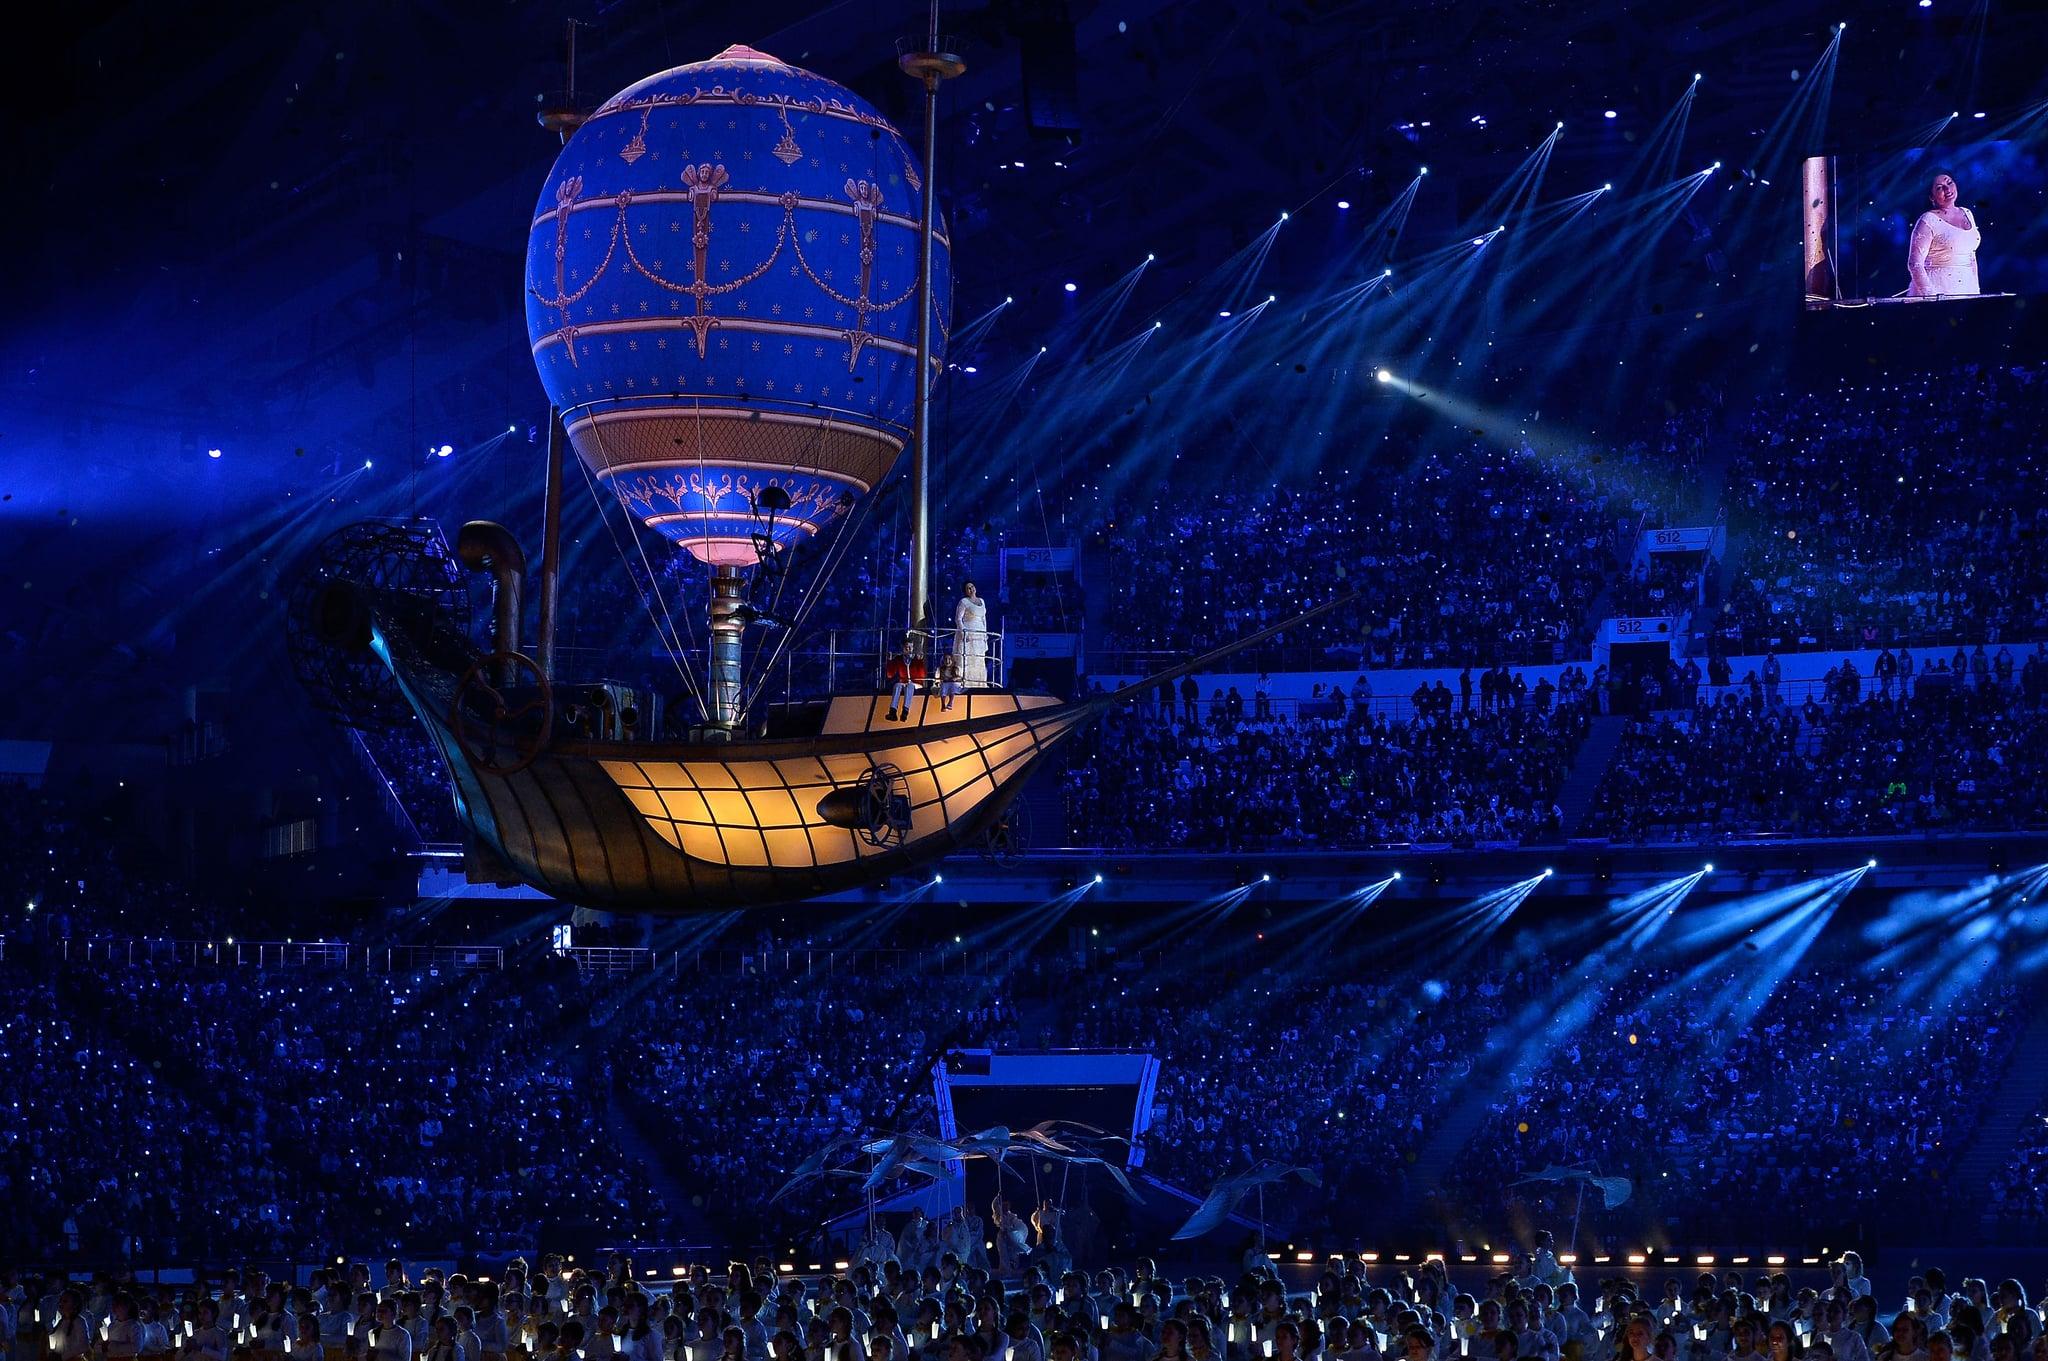 Russian singer Anna Netrebko performed from inside a glowing gondola.